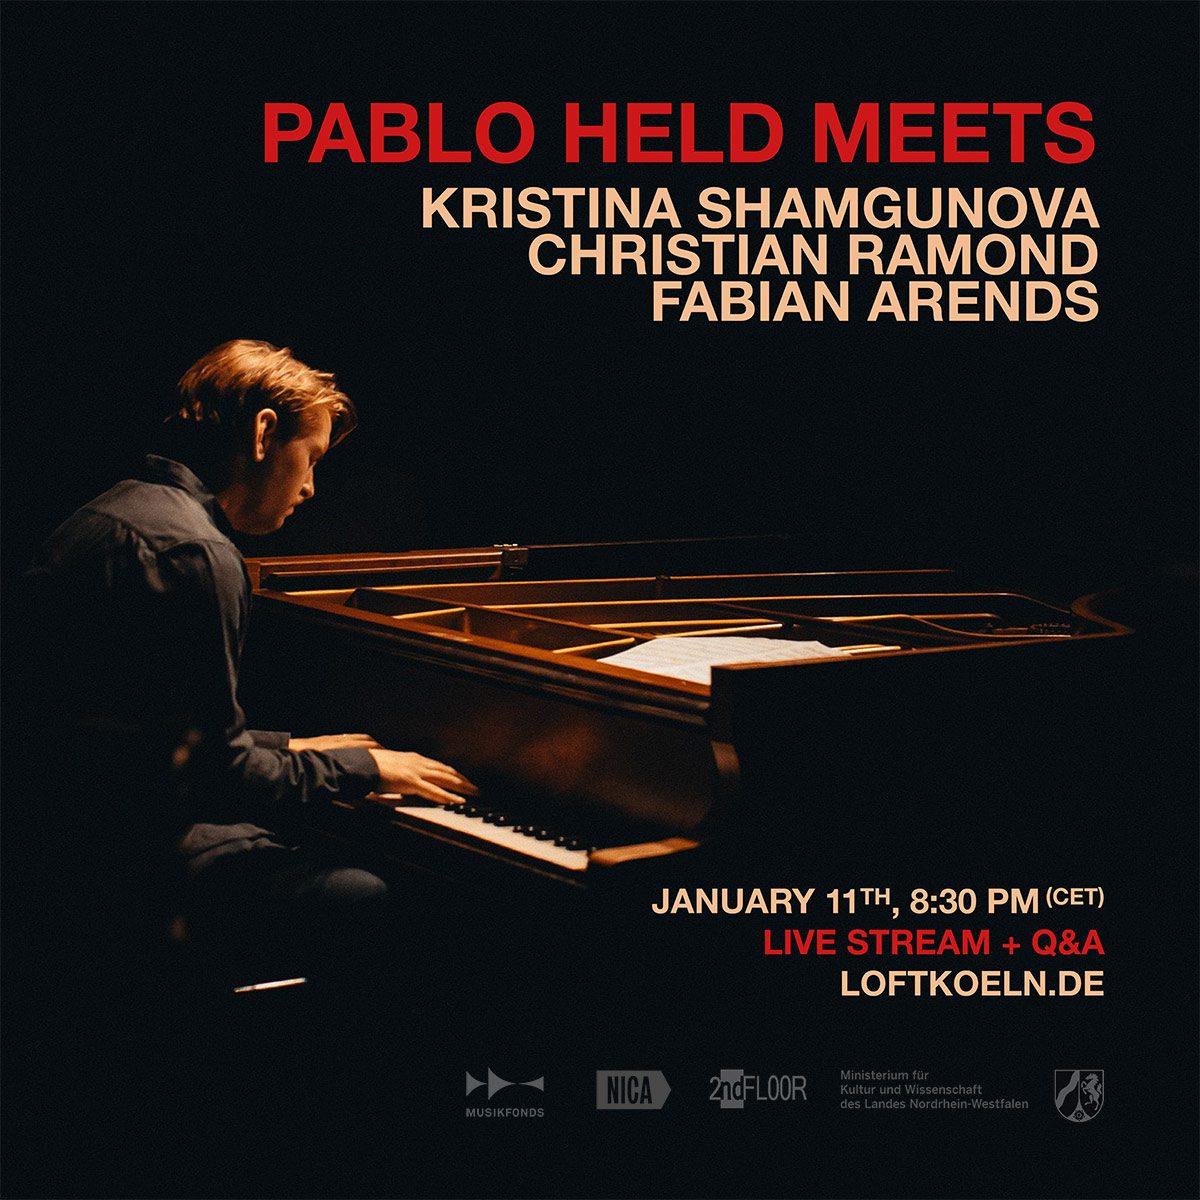 Kristina Shamgunova, Pablo Held, Christian Ramond, Fabian Arends, meets, LOFT, Cologne, Köln, livestream, Christian Heck